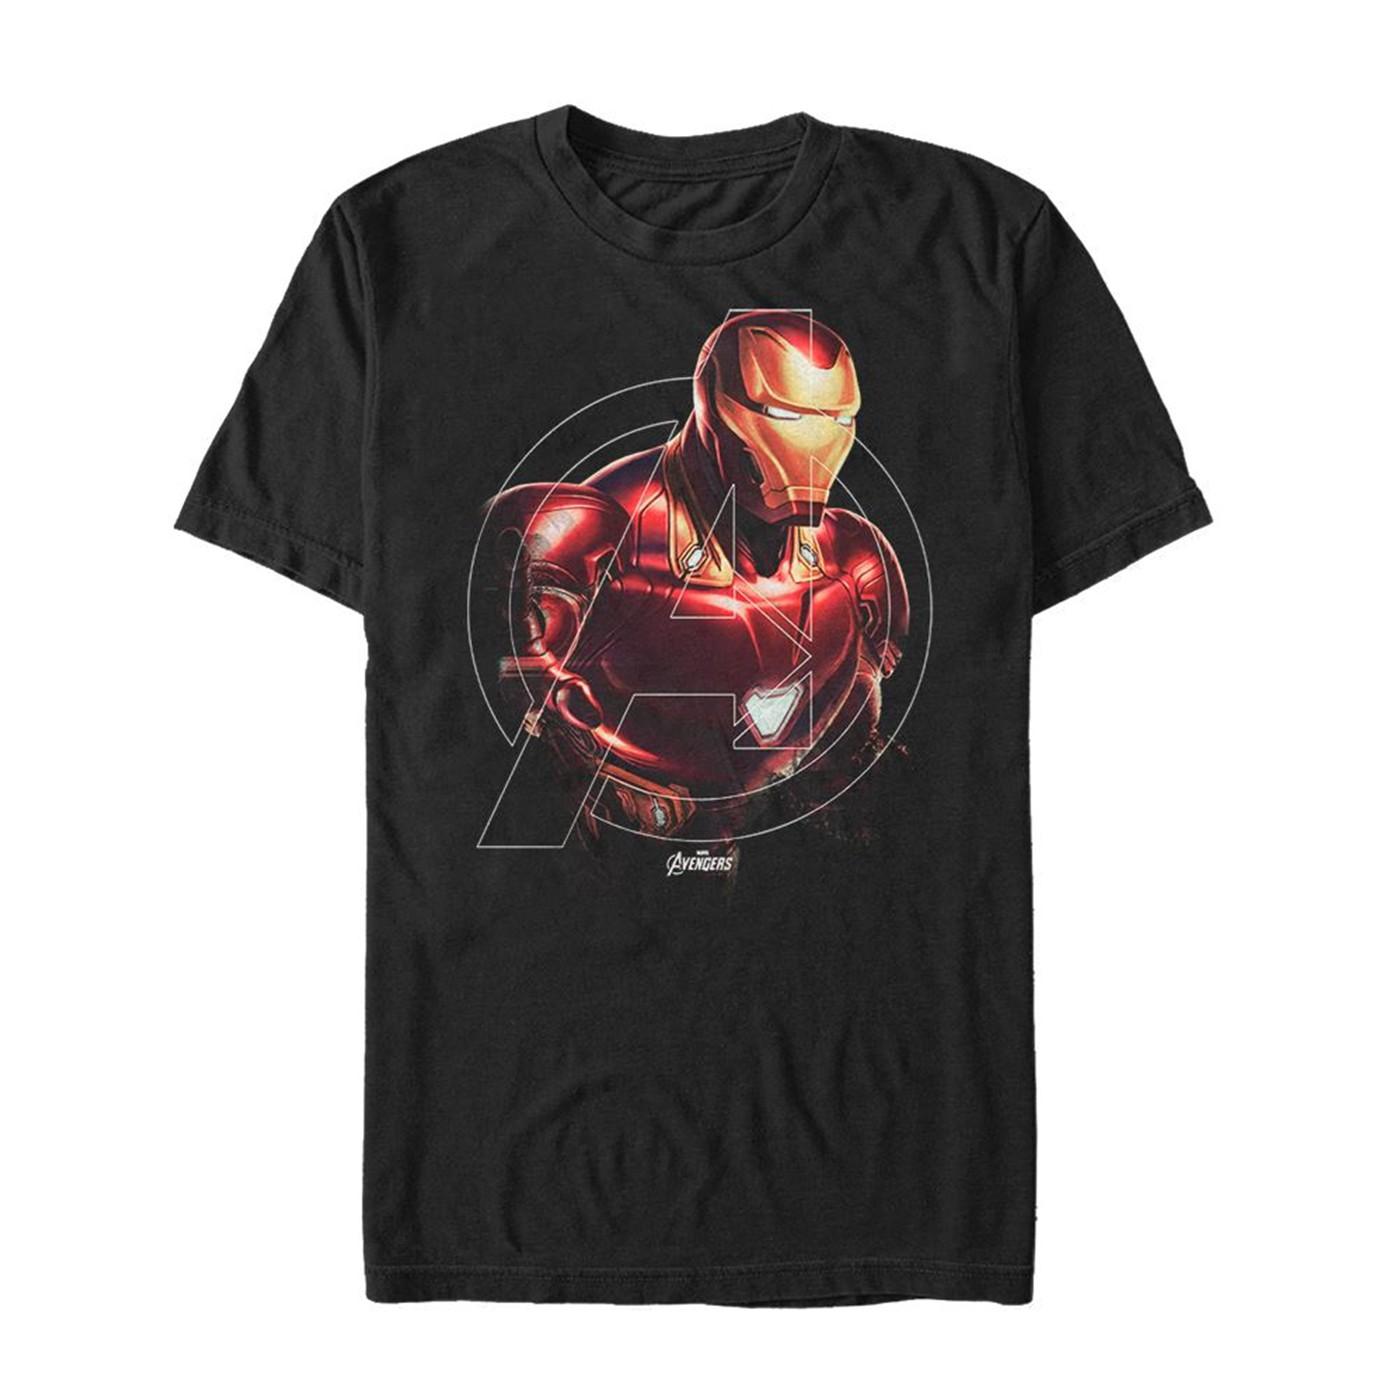 Avenger Endgame Iron Man Iron Hero Men's T-Shirt